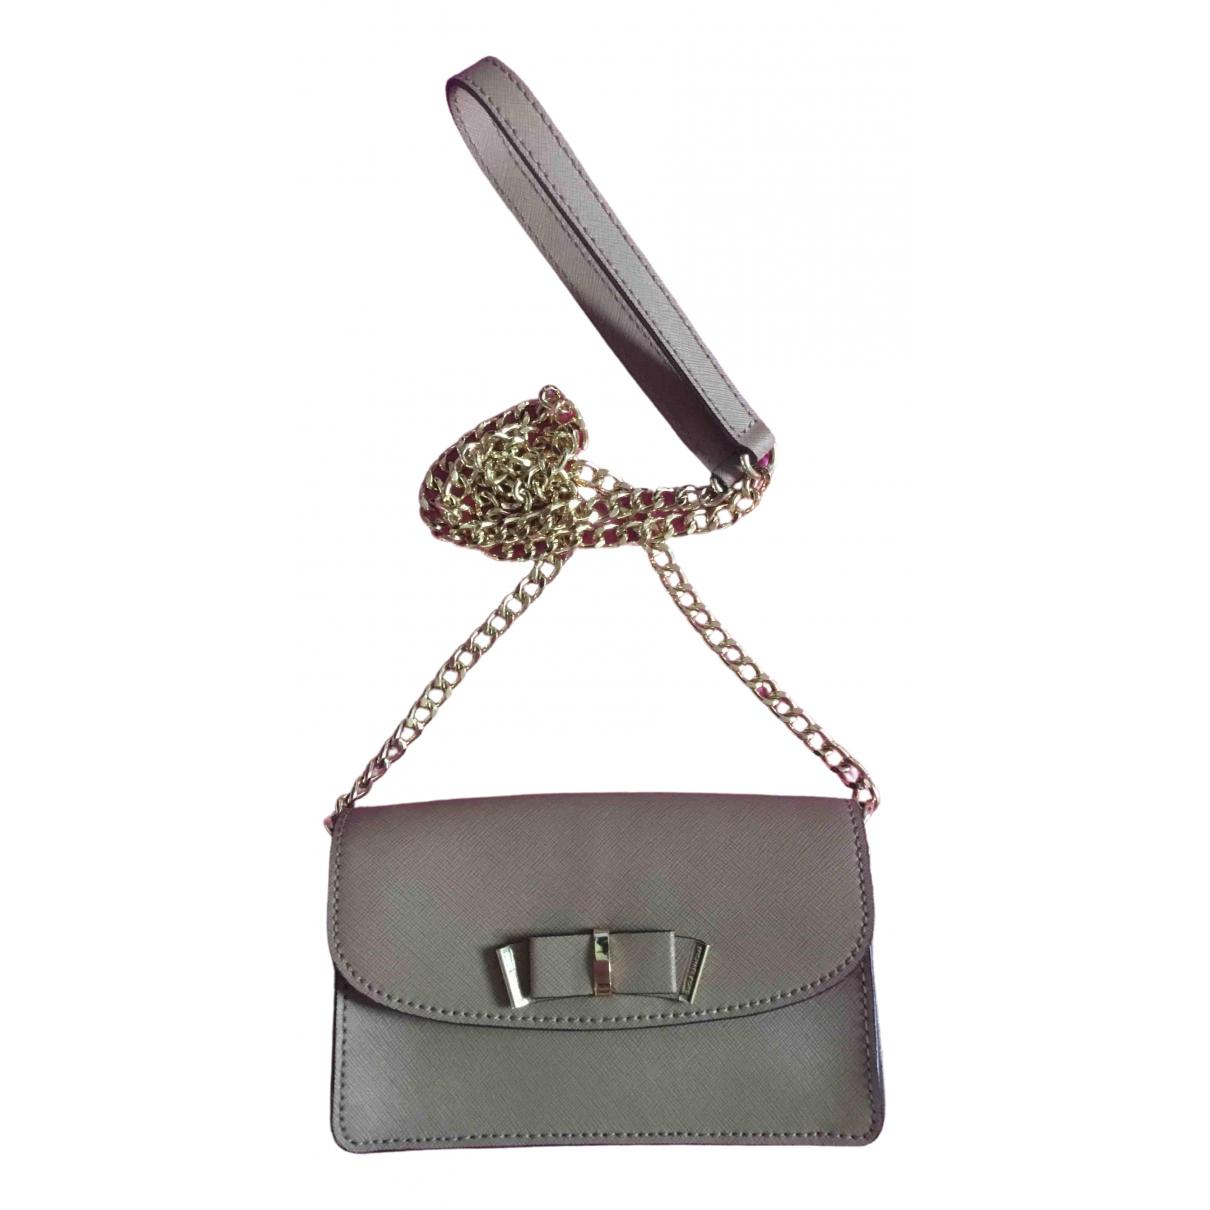 Michael Kors \N Brown handbag for Women \N